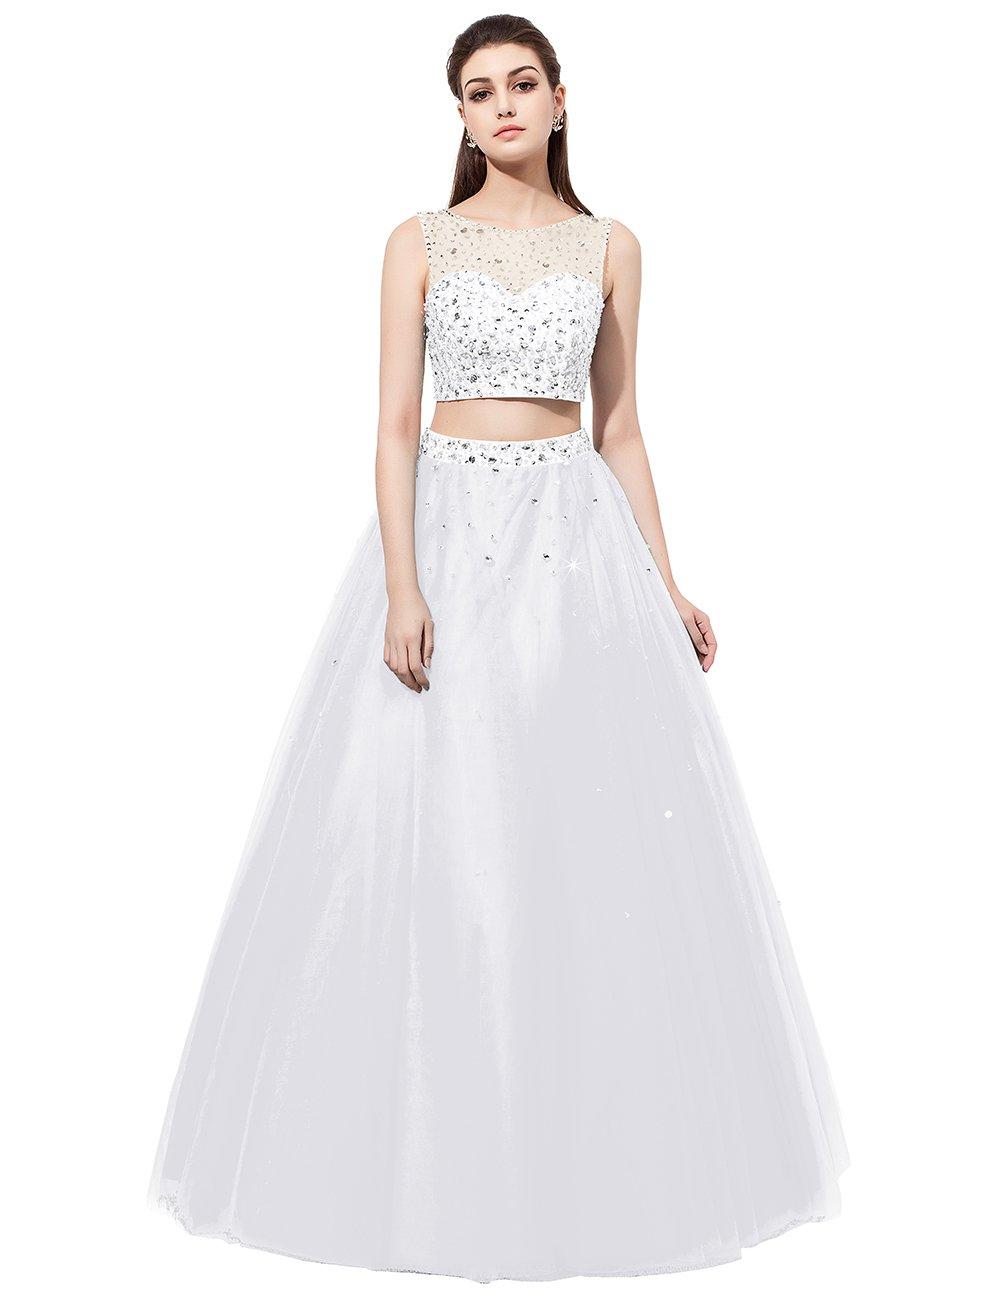 Dresstell 演奏会ドレス ステージドレス ビジュー付き ツーピースドレス 袖なし ビスチェタイプ 発表会ドレス カラーチュチュ 舞台ドレス B01MR2UPU5 JP17|ホワイト ホワイト JP17